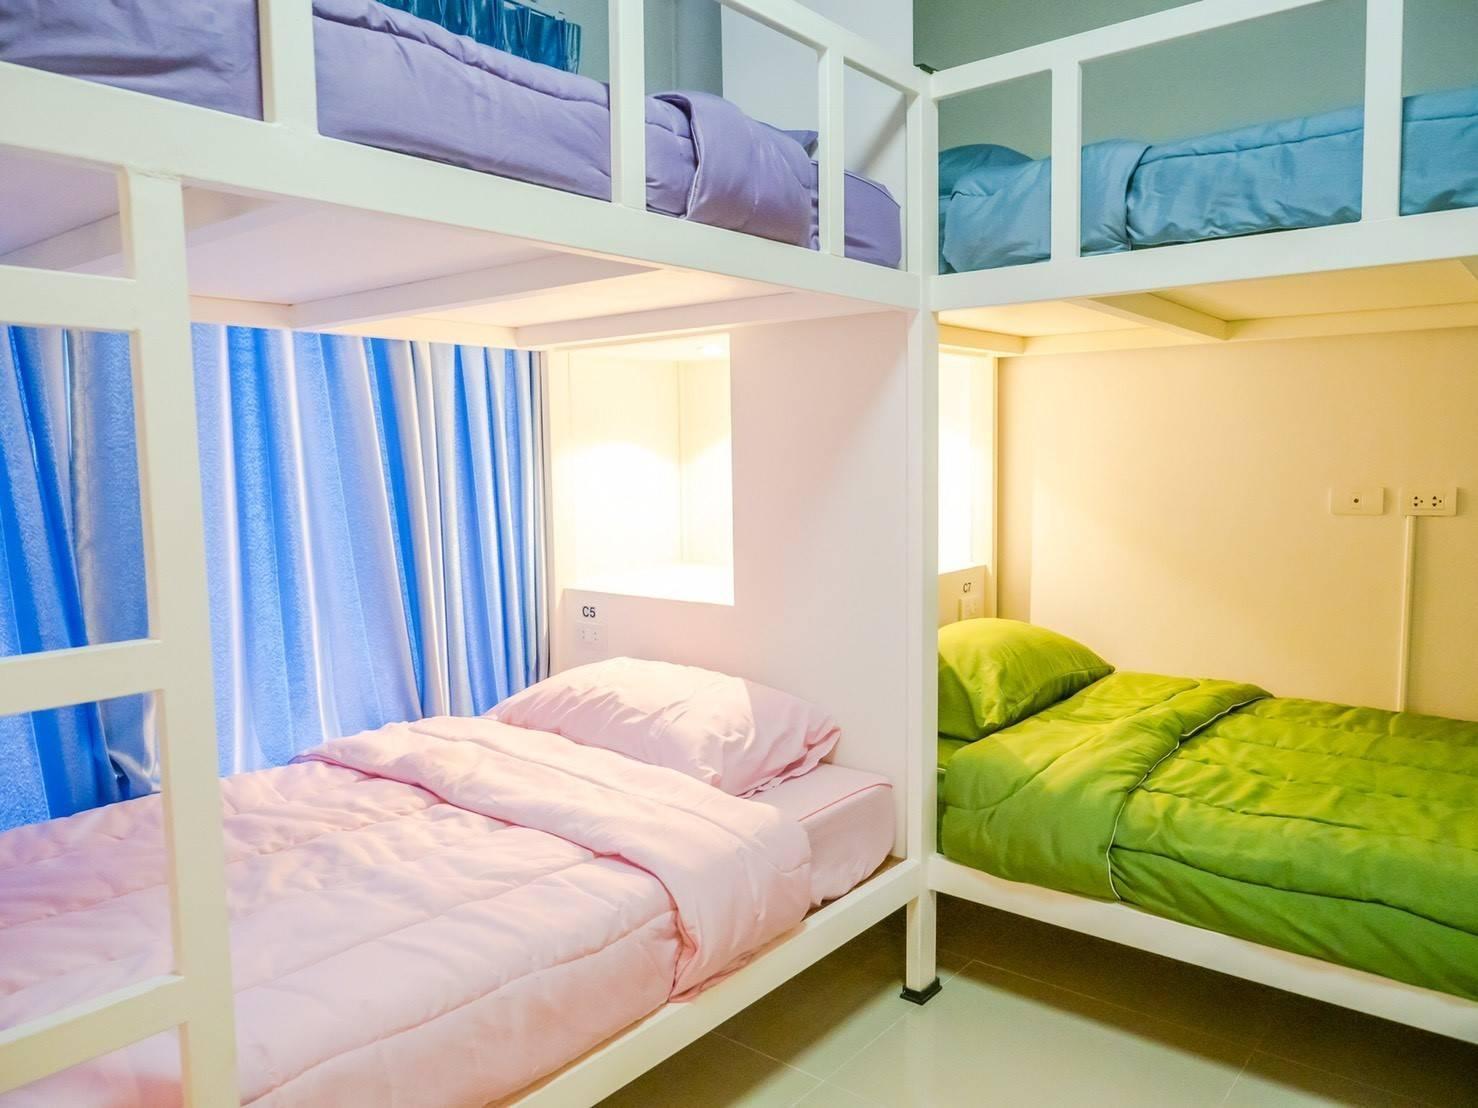 Private room in townhouse hosted by Thitirat อพาร์ตเมนต์ 1 ห้องนอน 4 ห้องน้ำส่วนตัว ขนาด 50 ตร.ม. – สันทราย